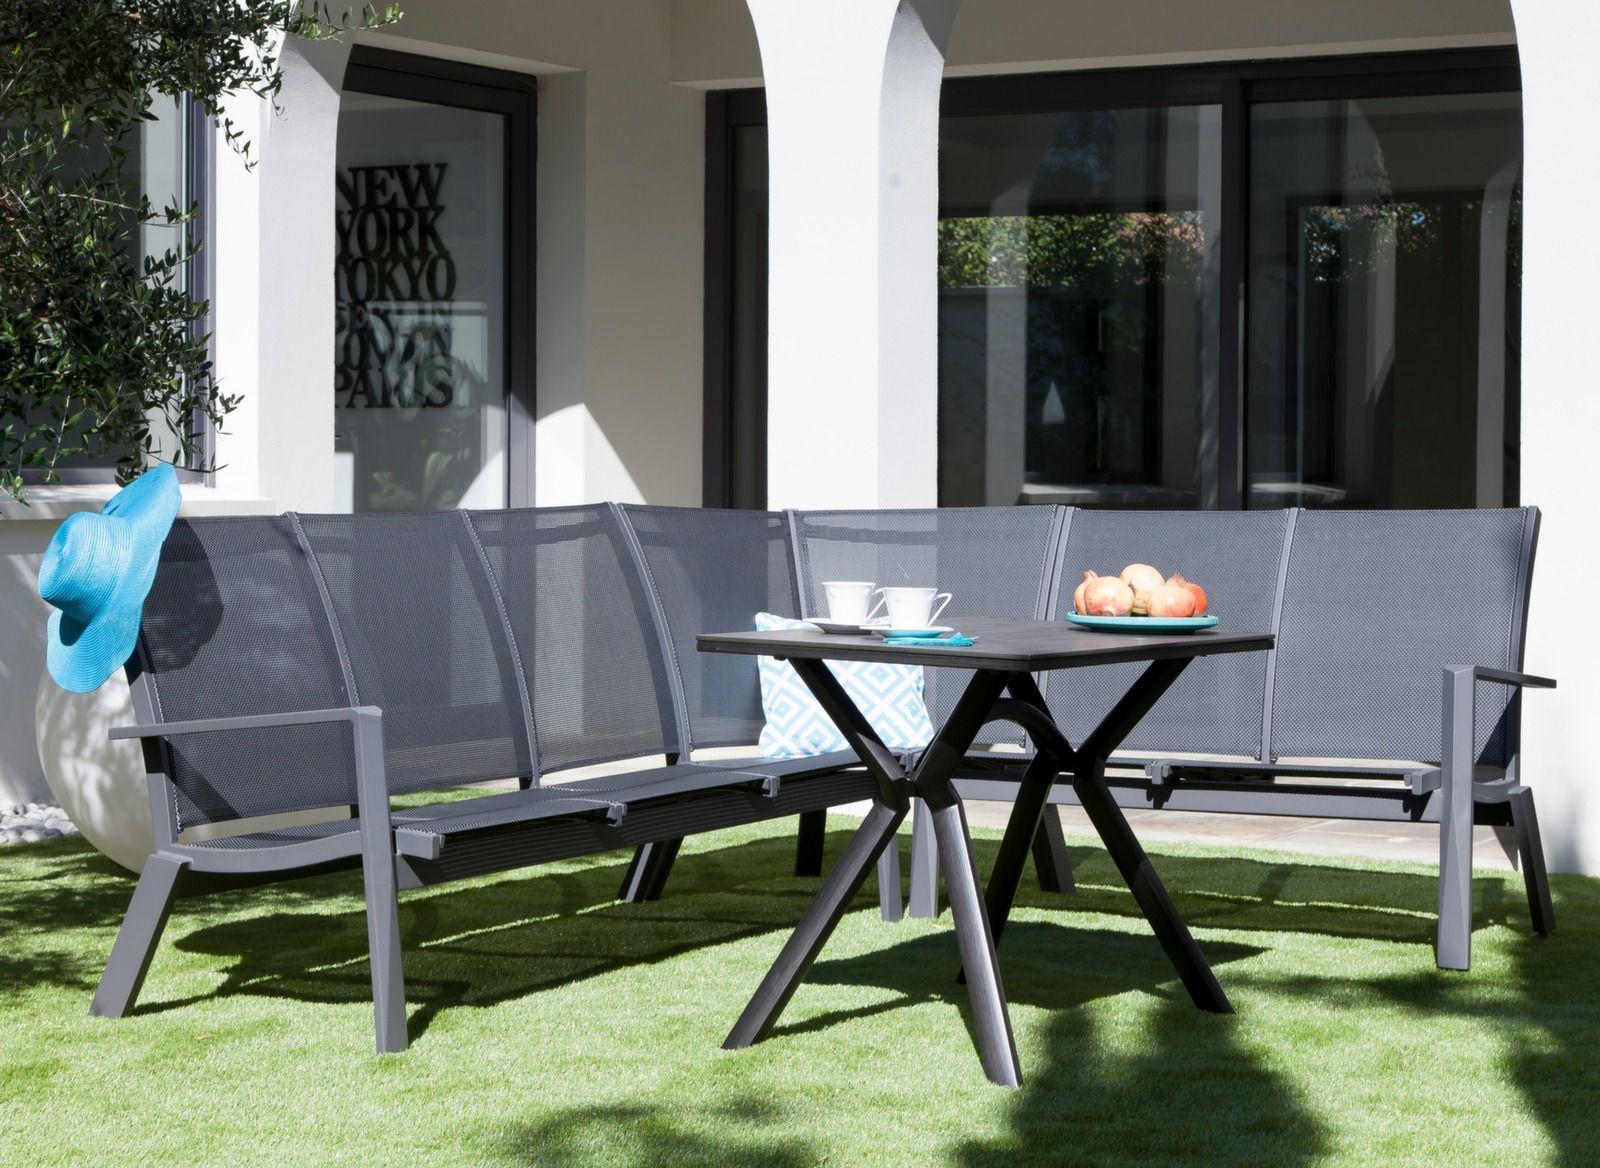 Salon de jardin avec fauteuil d 39 angle meubles de jardin proloisirs - Salon de jardin avec fauteuil ...